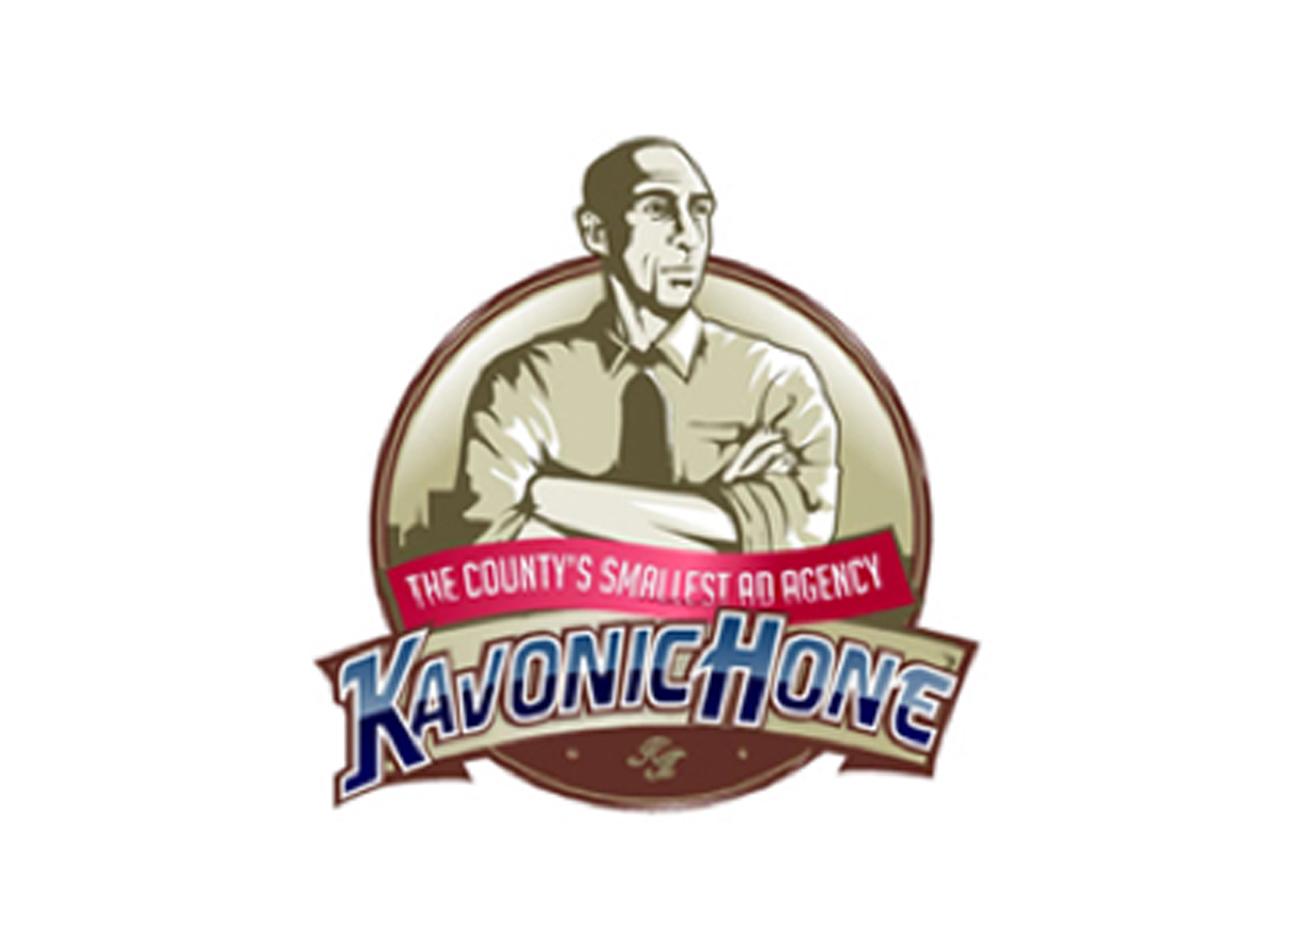 kavonic-hone-character-illustrative-logo-designers-agent-orange-graphic-agency-south-african-branding-company.jpg